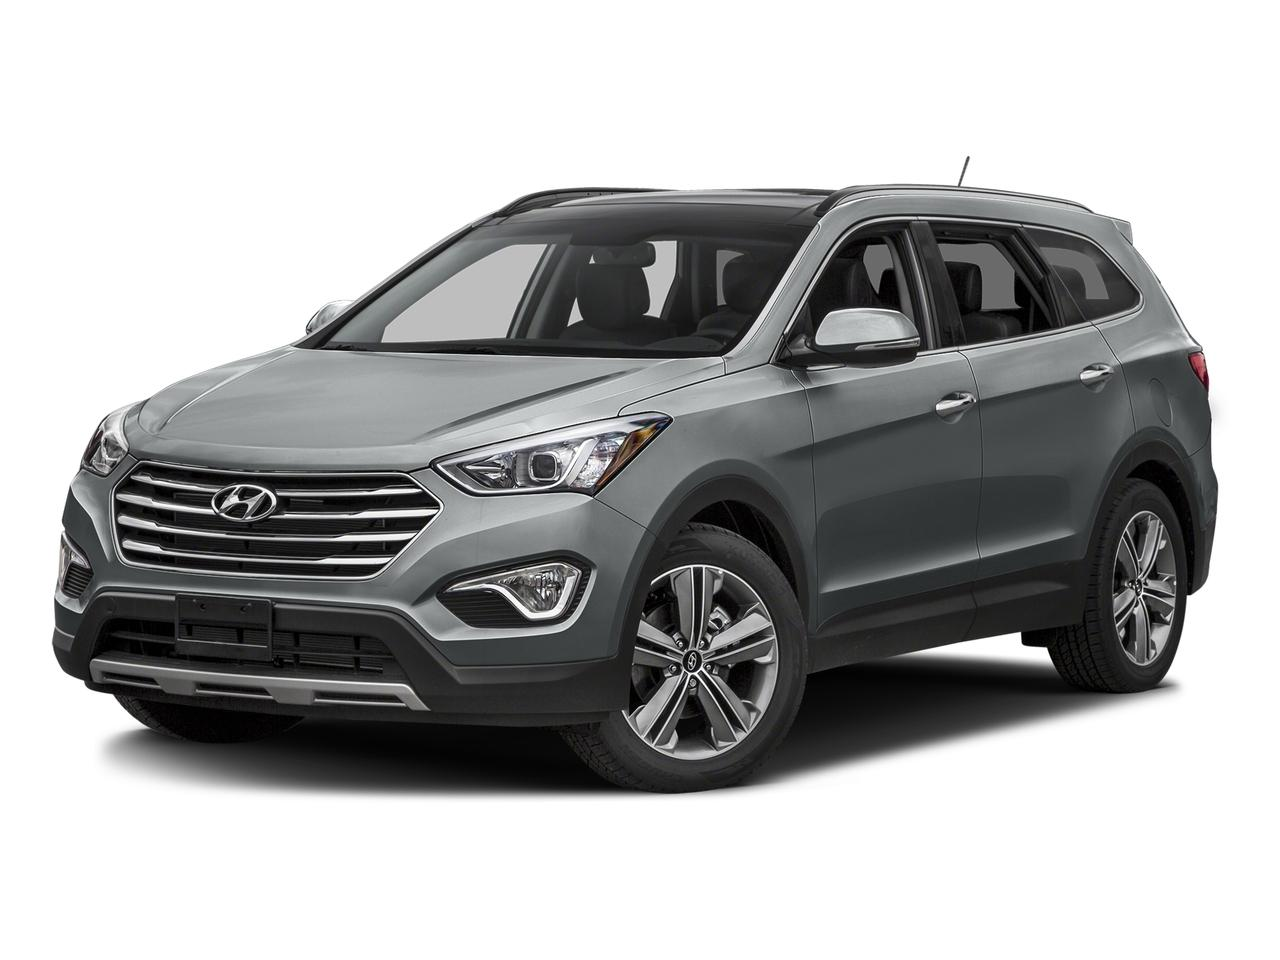 2016 Hyundai Santa Fe Vehicle Photo in Oakdale, CA 95361